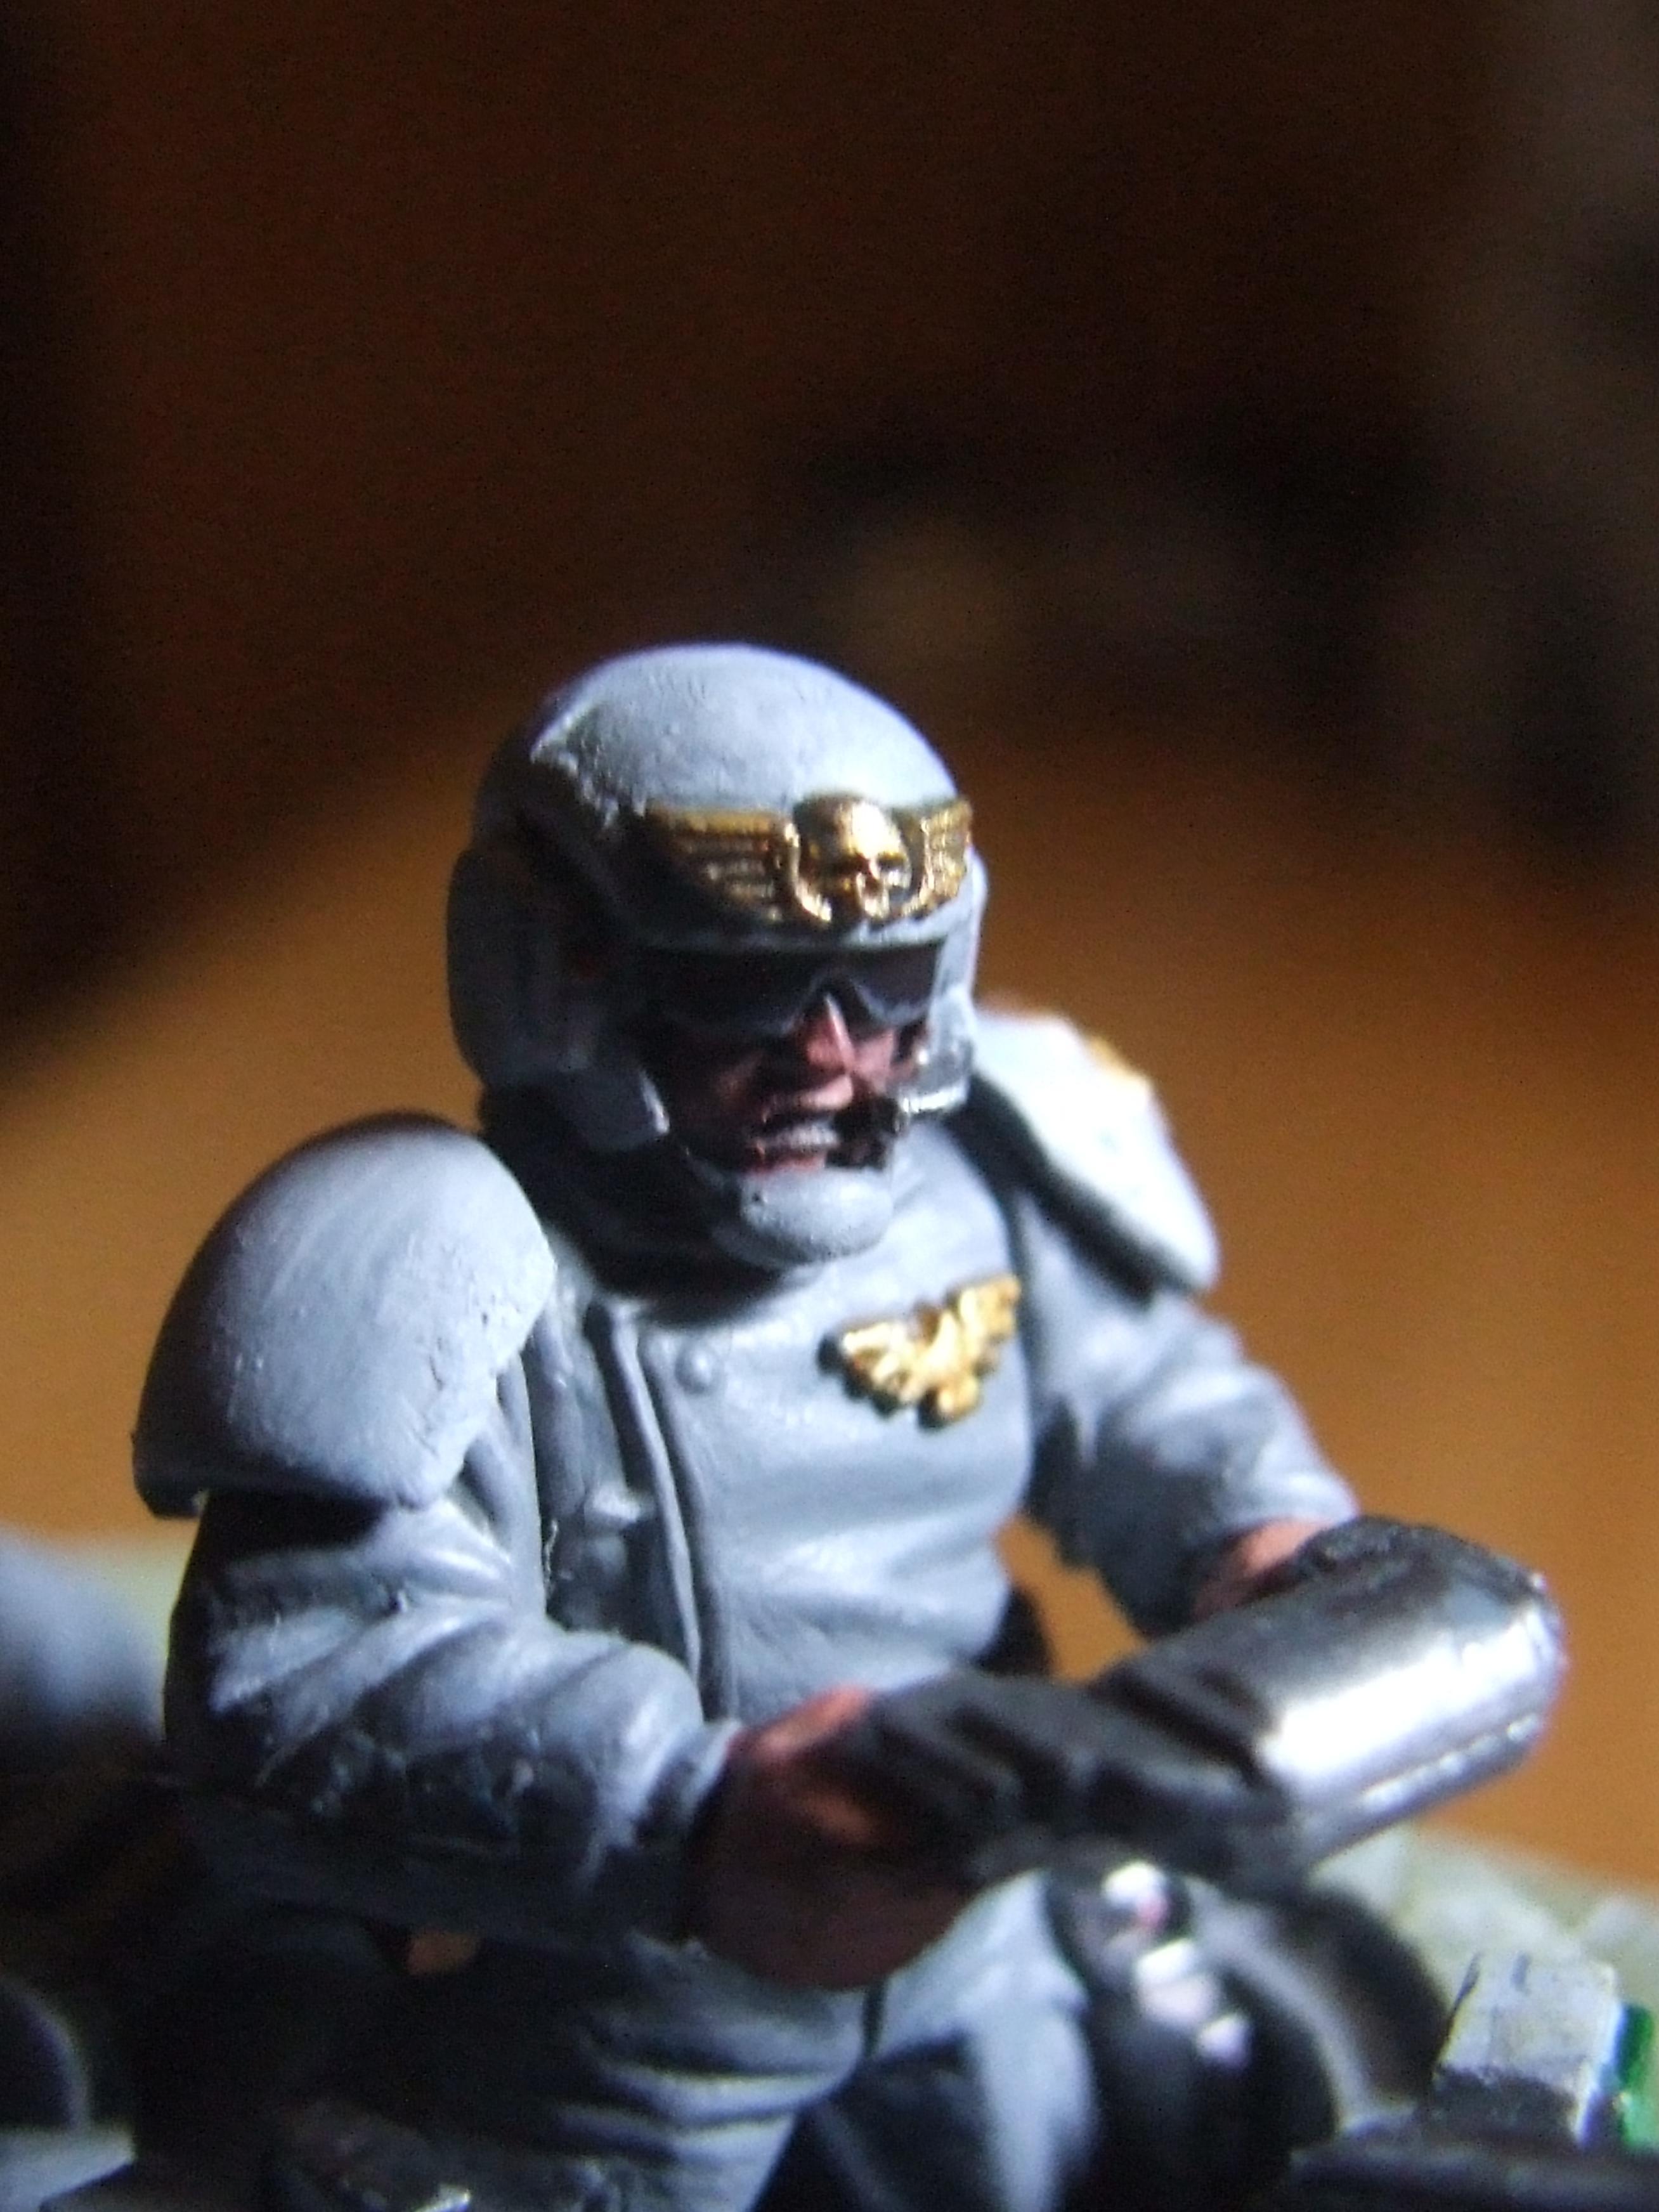 Cadians, Imperial Guard, Snow Camo